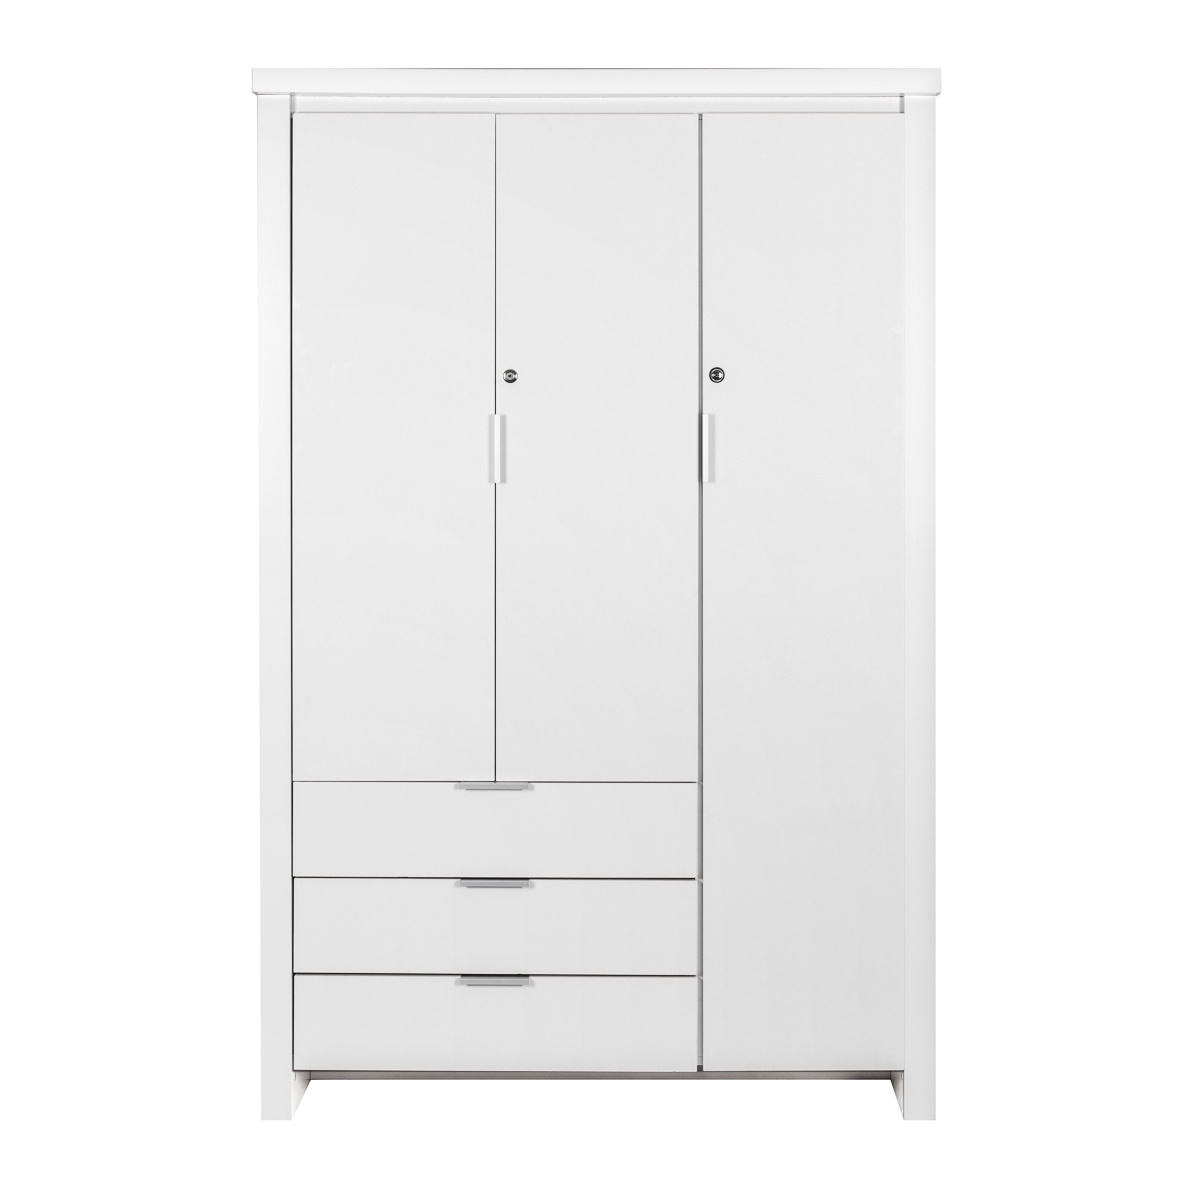 Safari 3 Door Wardrobe White Safari Collection Lifestyle Furniture Regarding 3 Door White Wardrobes (View 13 of 25)